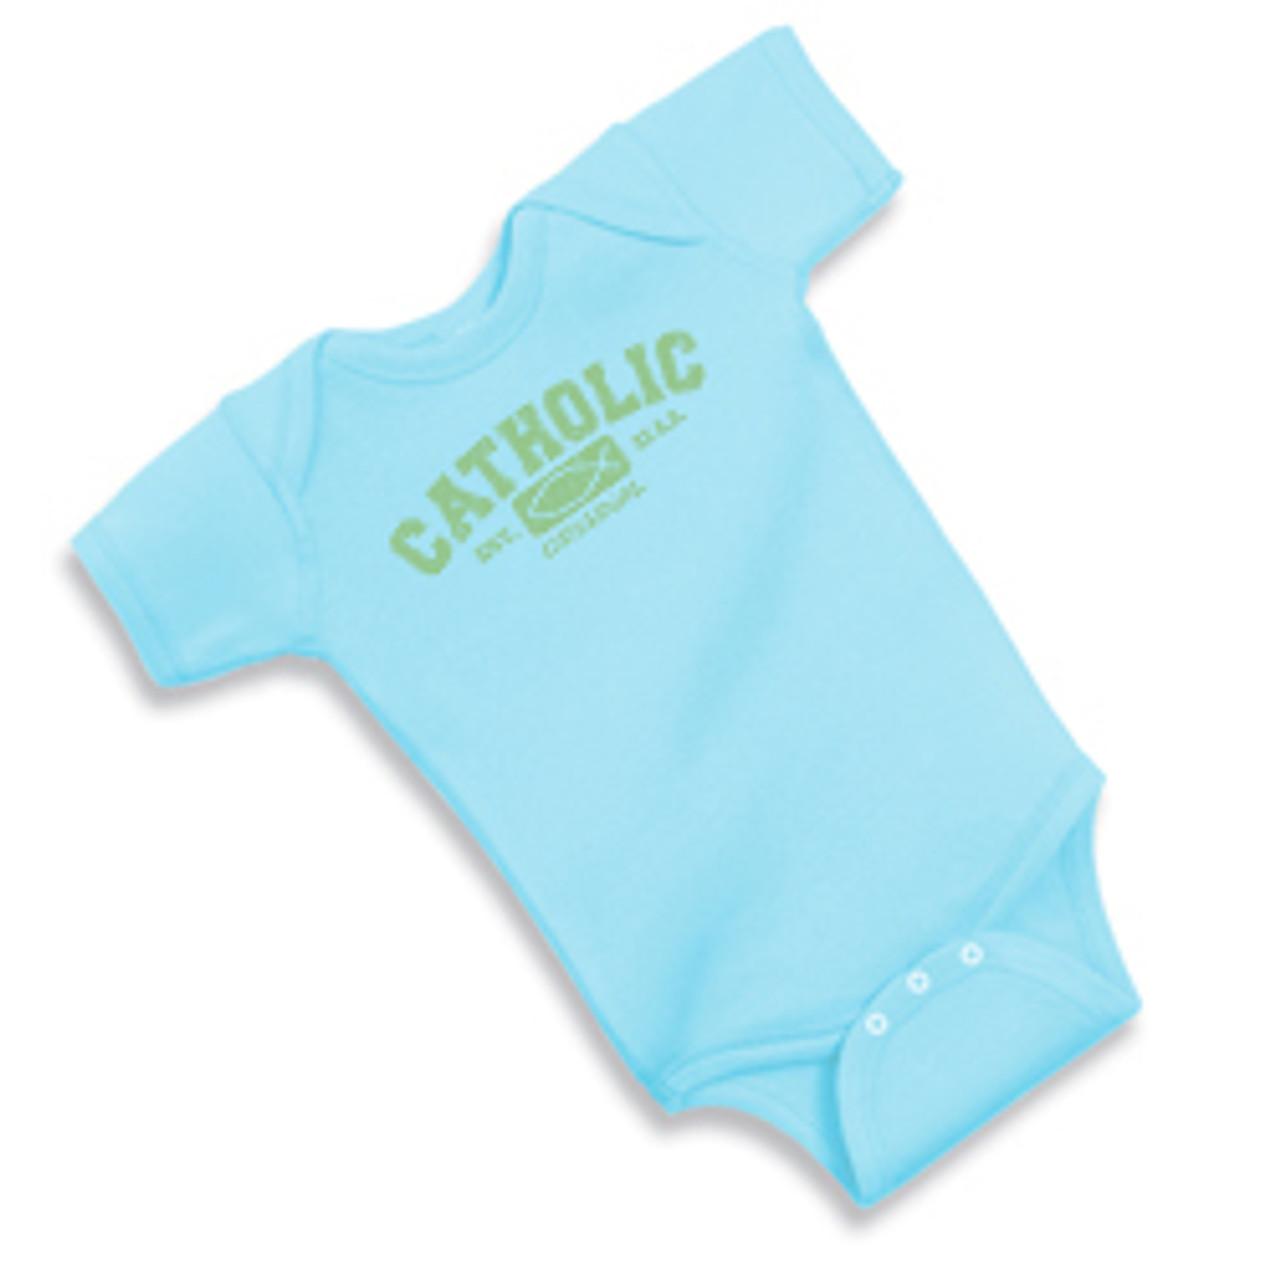 Catholic Original Baby Onesie